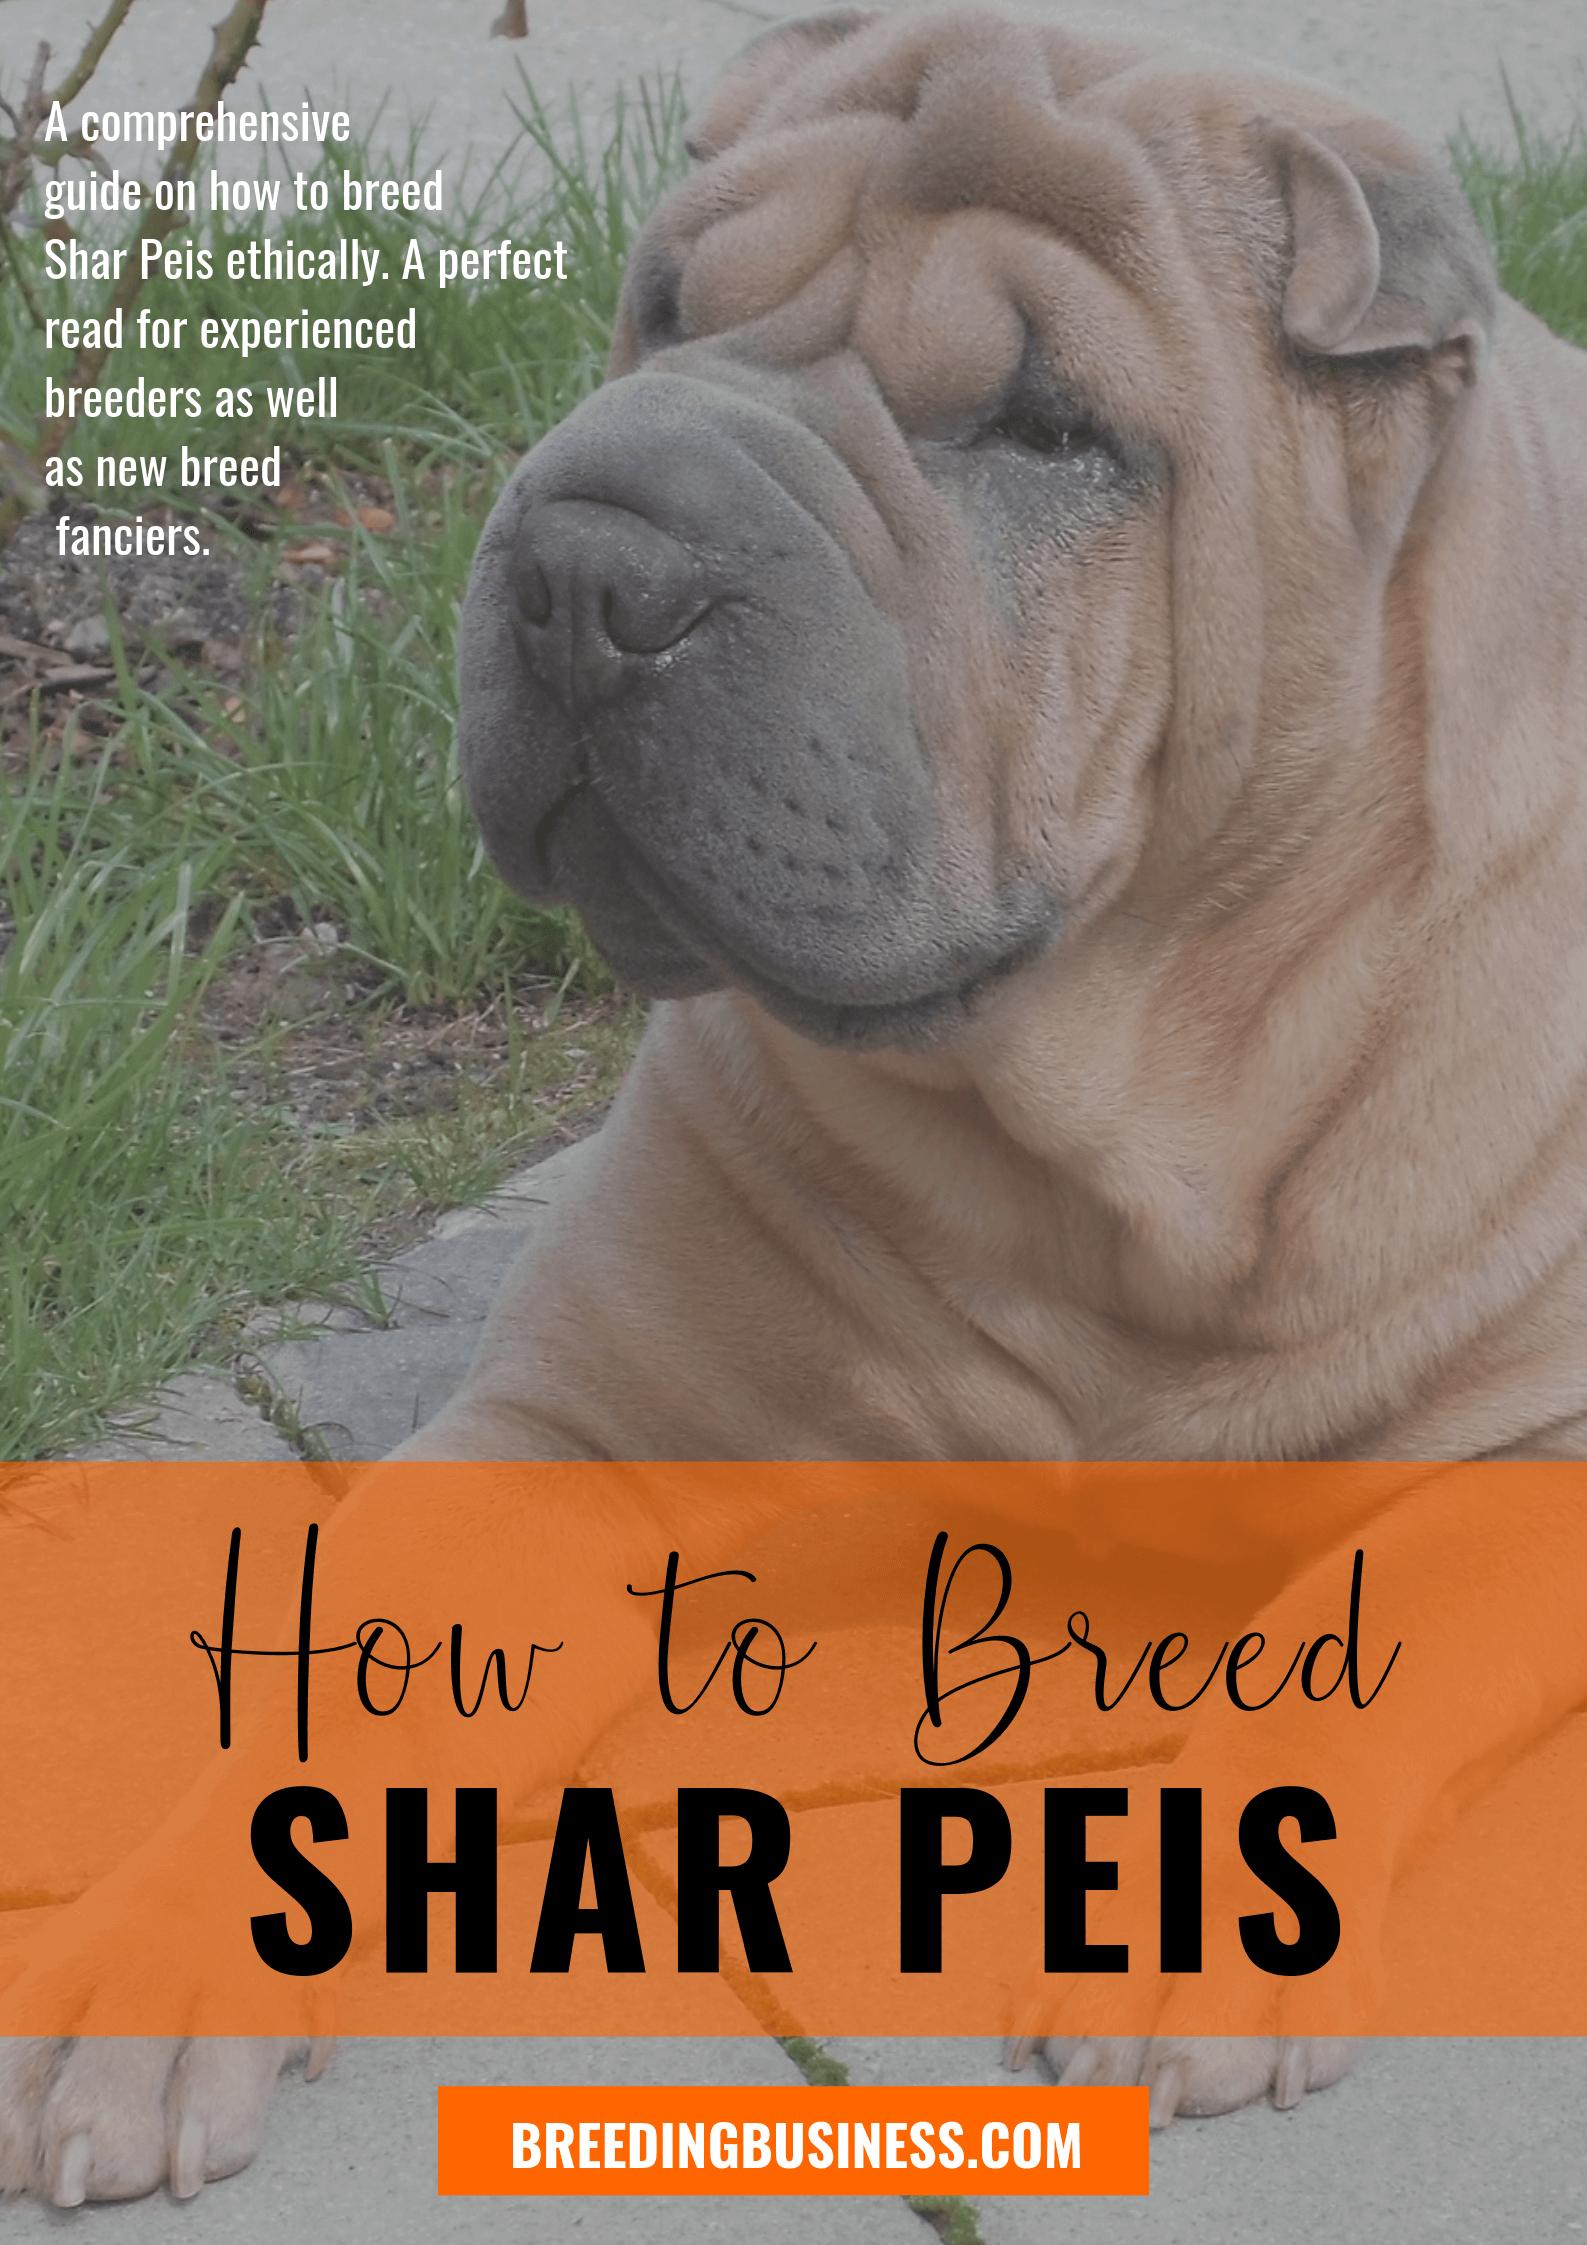 breeding Shar Peis